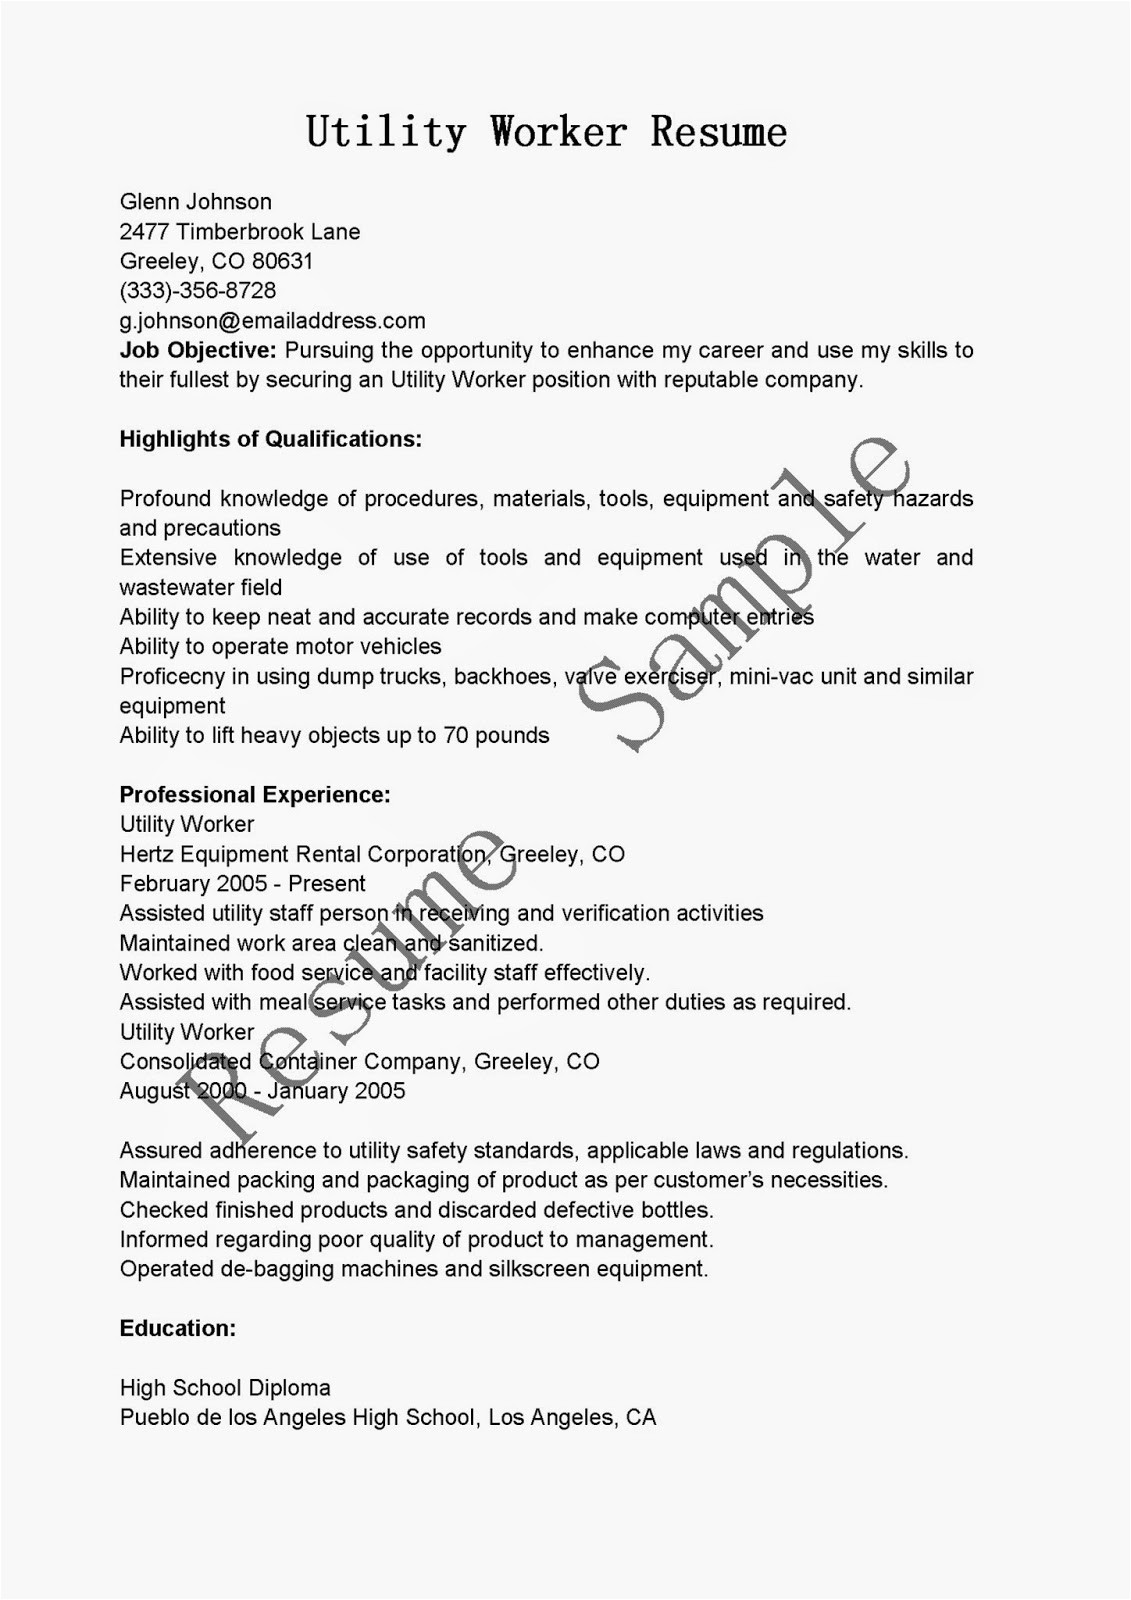 utility worker resume sample